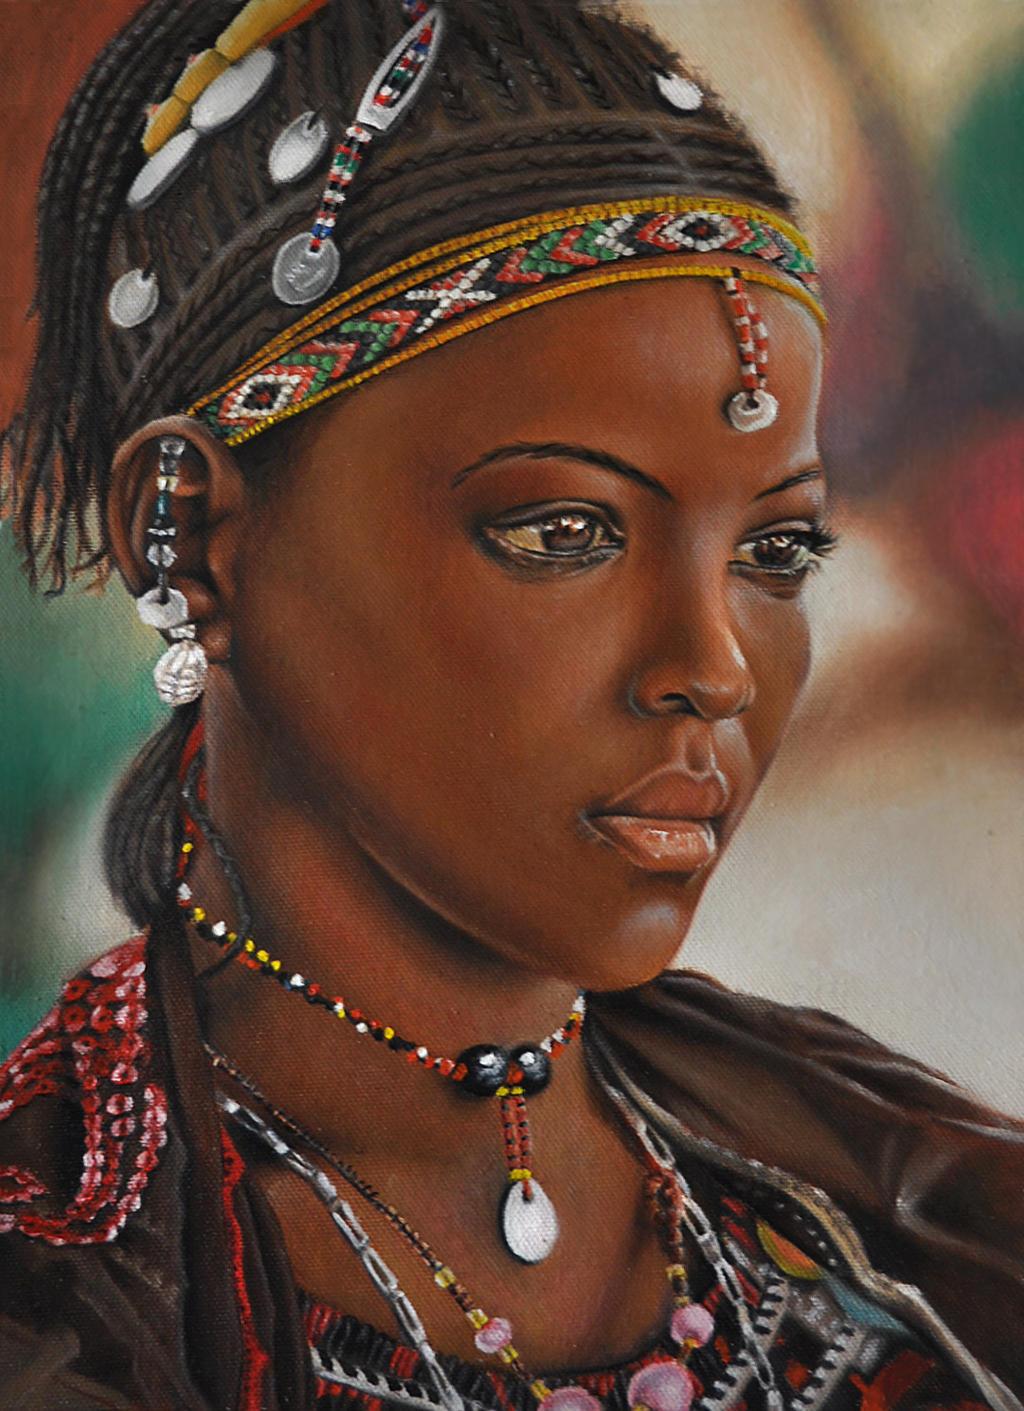 Fulani girl - Nigeria by Lianne-Issa